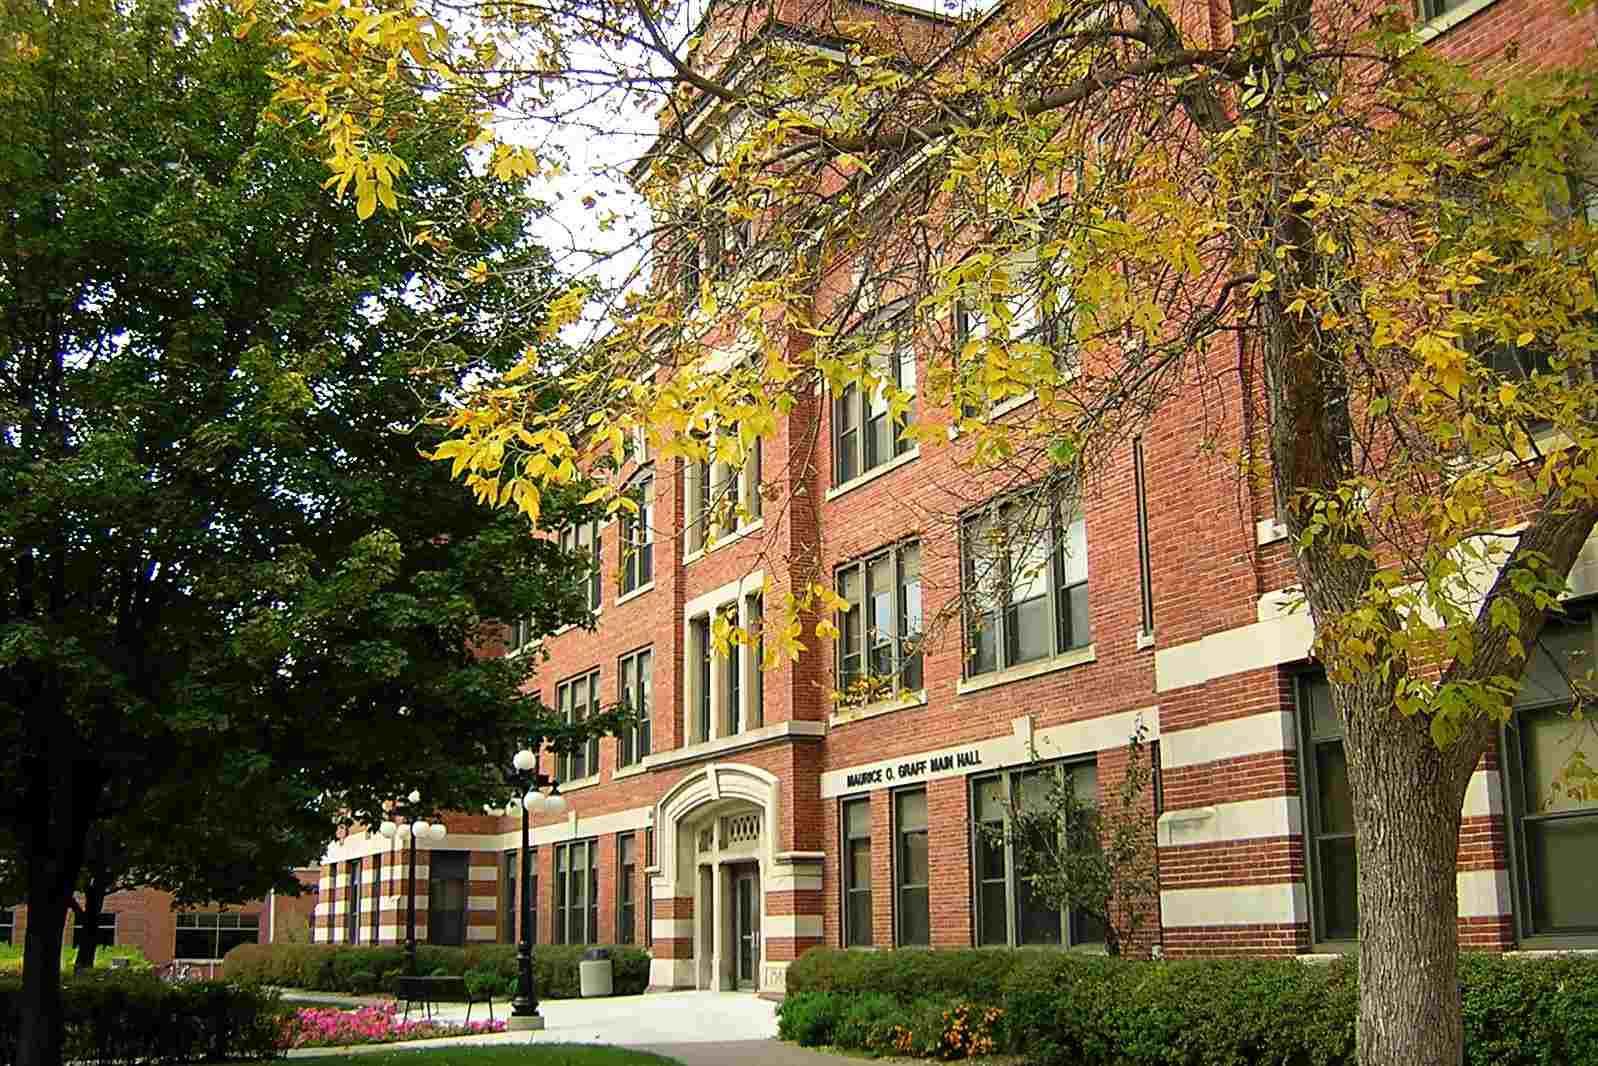 Main Hall at the University of Wisconsin La Crosse